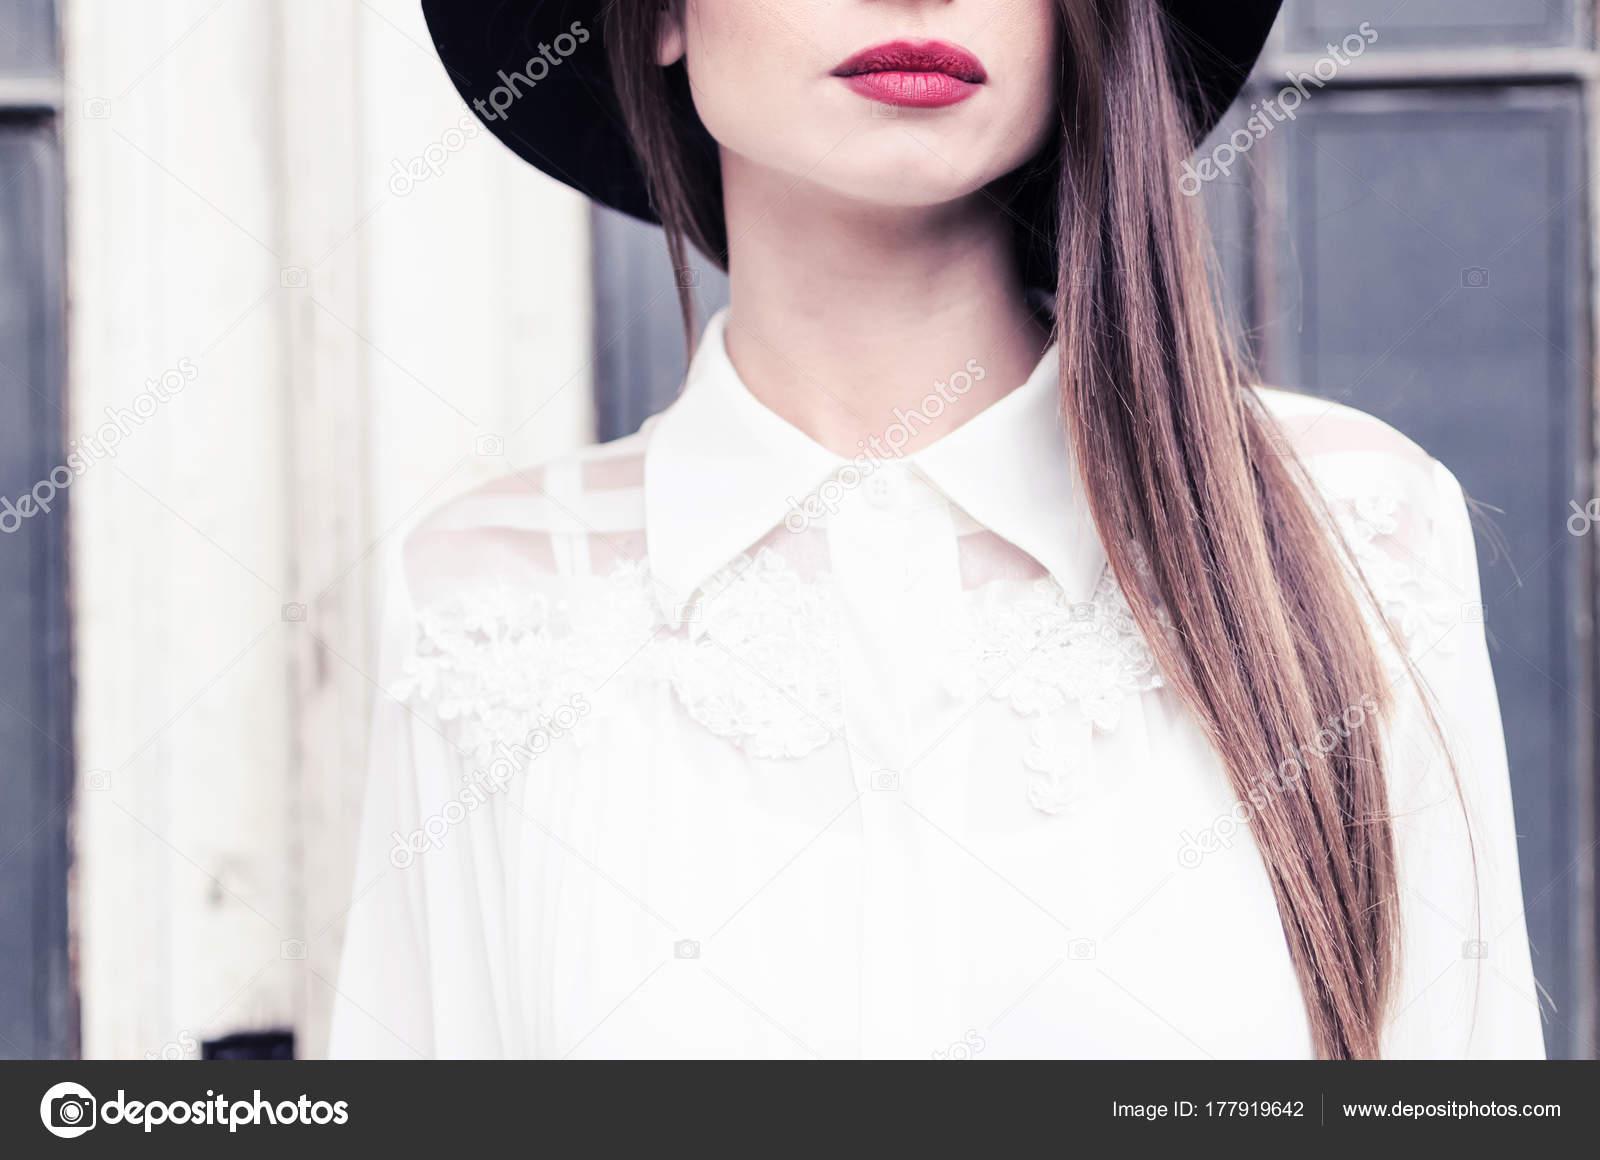 3e9c234c51be Γυναίκα Των Επιχειρήσεων Θηλυκό Λεπτομέρειες Ρούχα Κορίτσι Δαντέλα Λευκό  Πουκάμισο– εικόνα αρχείου